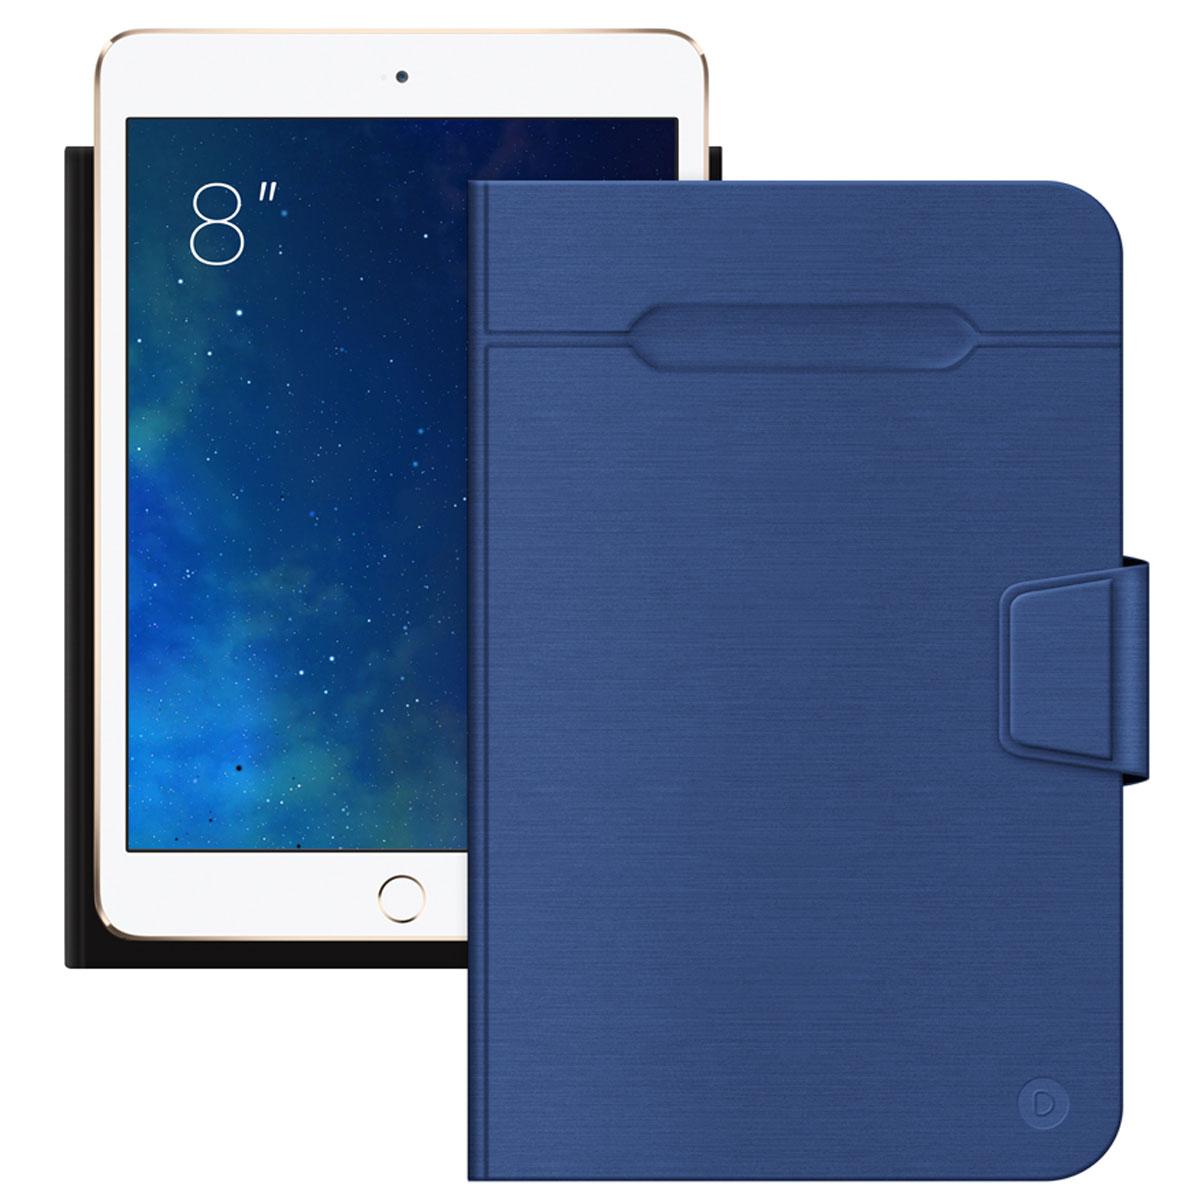 Deppa Wallet Fold чехол-подставка для планшетов 8'', Blue